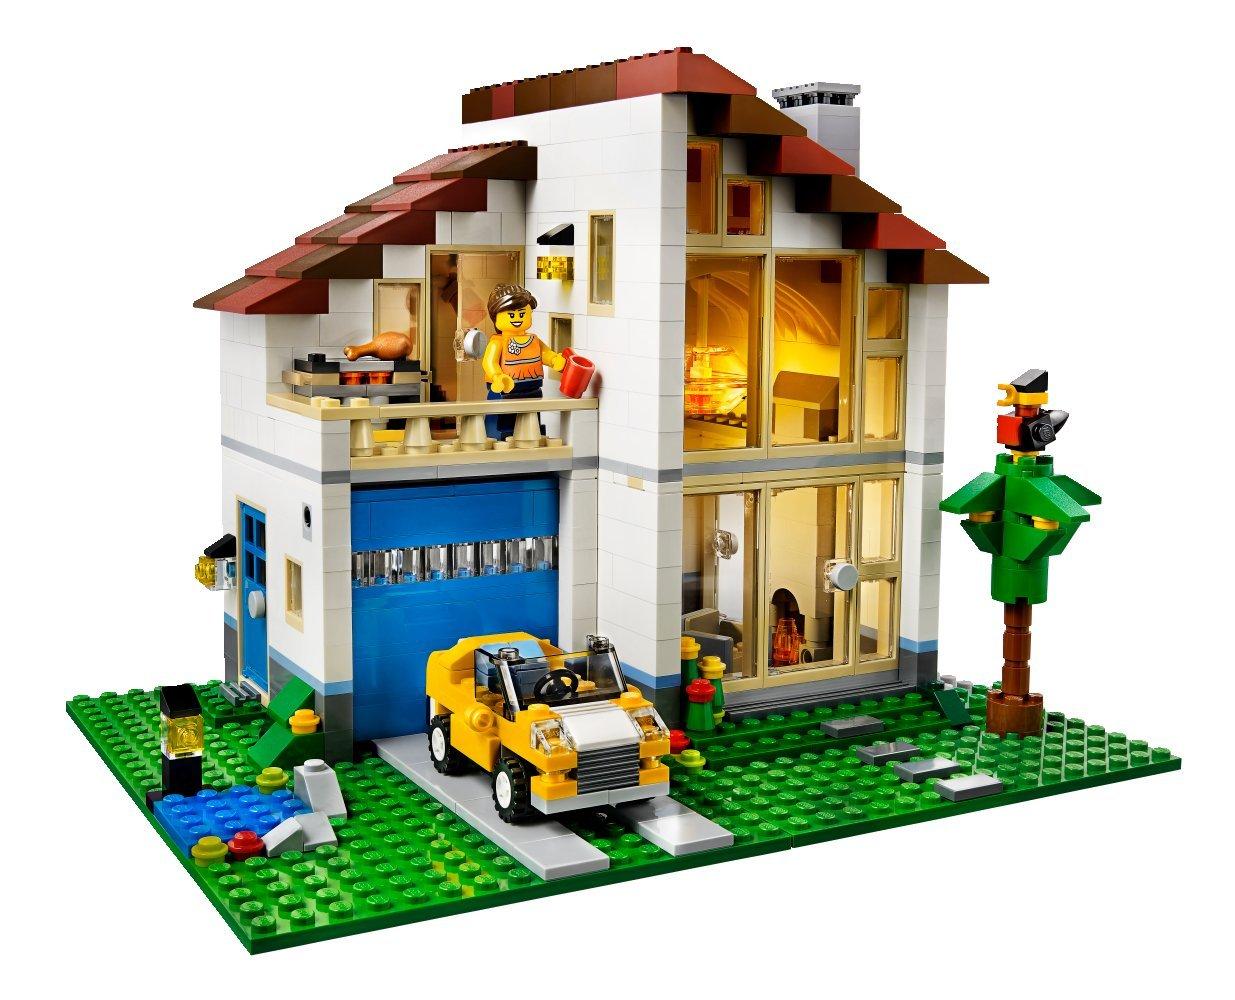 Making The Modular Creator Set 31012 Family House A Little